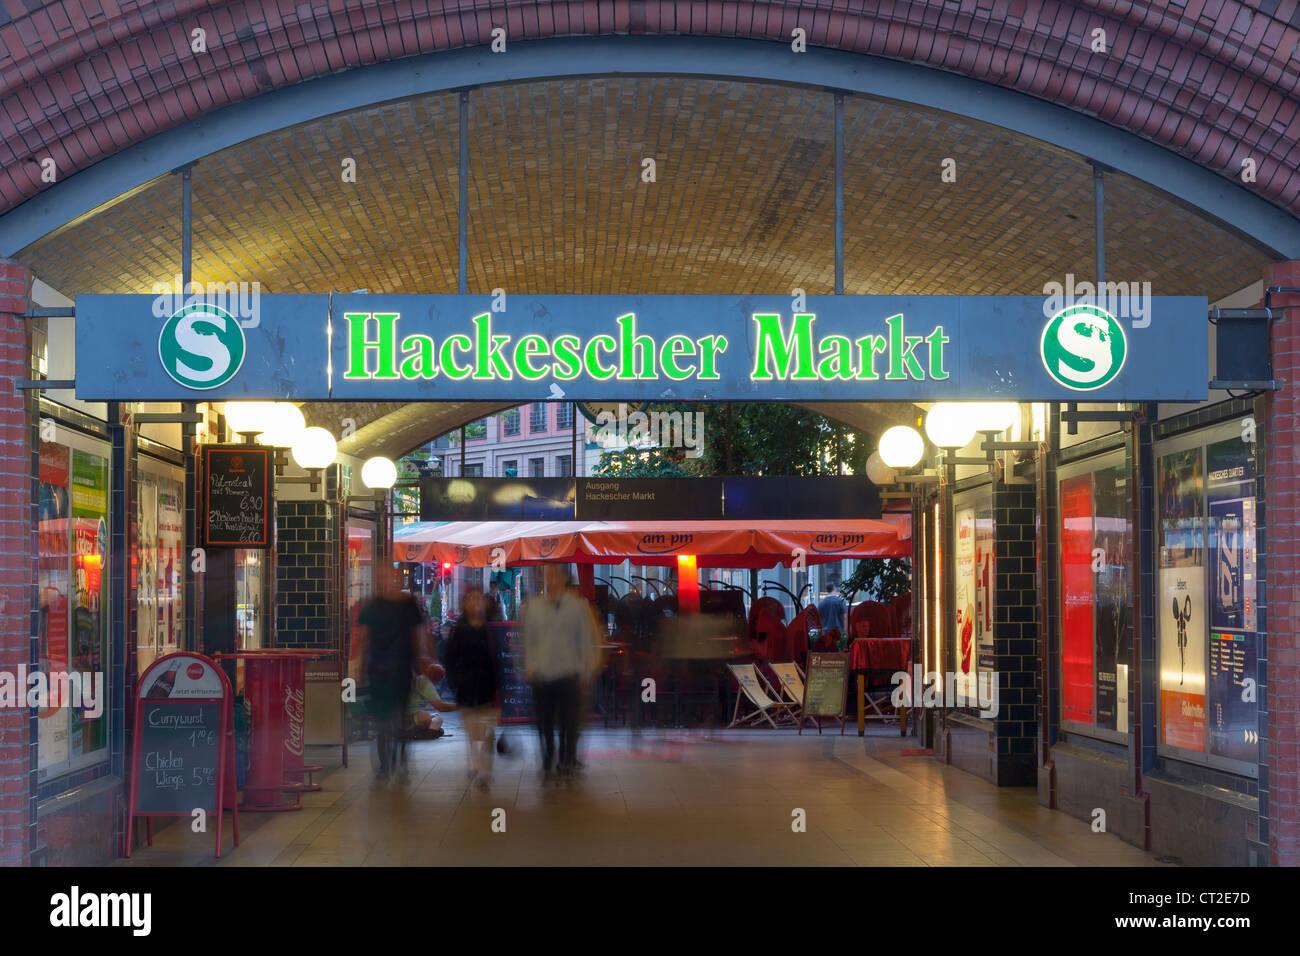 Hackescher Markt S Bahn station, Berlin, Germany Stock Photo